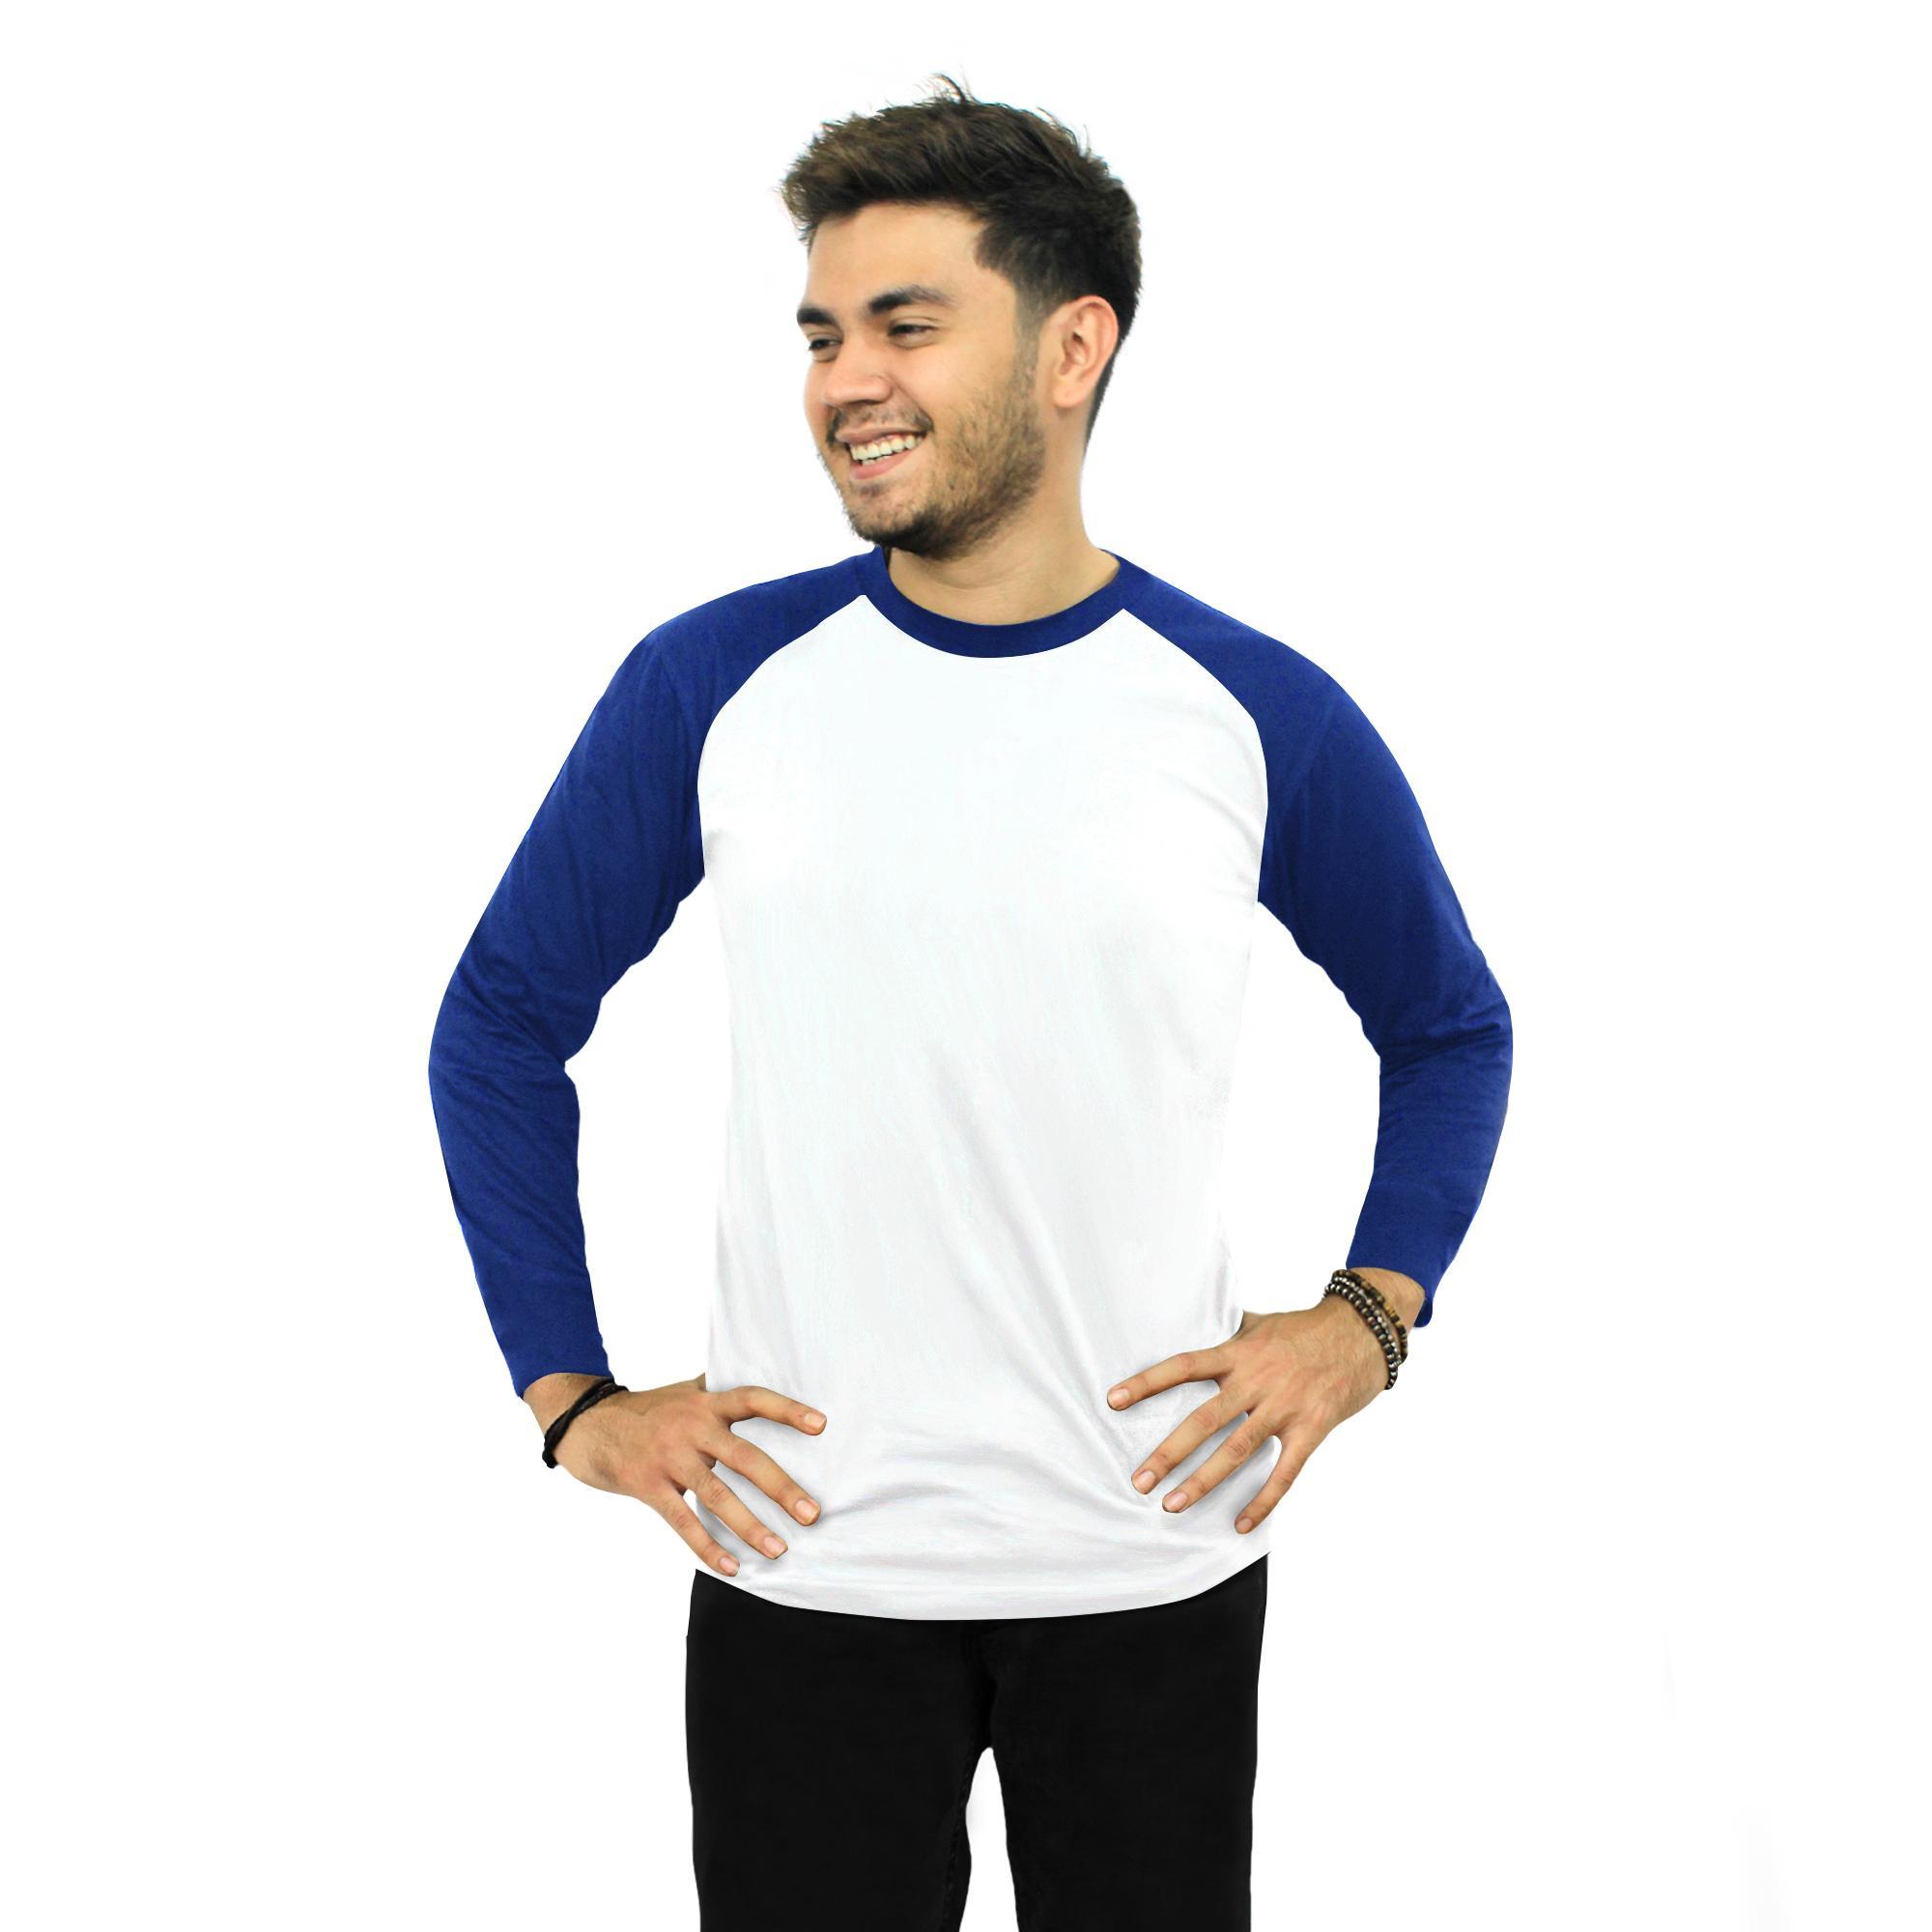 Kaos Polos Raglan Lengan Panjang 3/4 - JUMBO - Soft Cotton Combed 30S / Cotton T-Shirt Long Sleeves